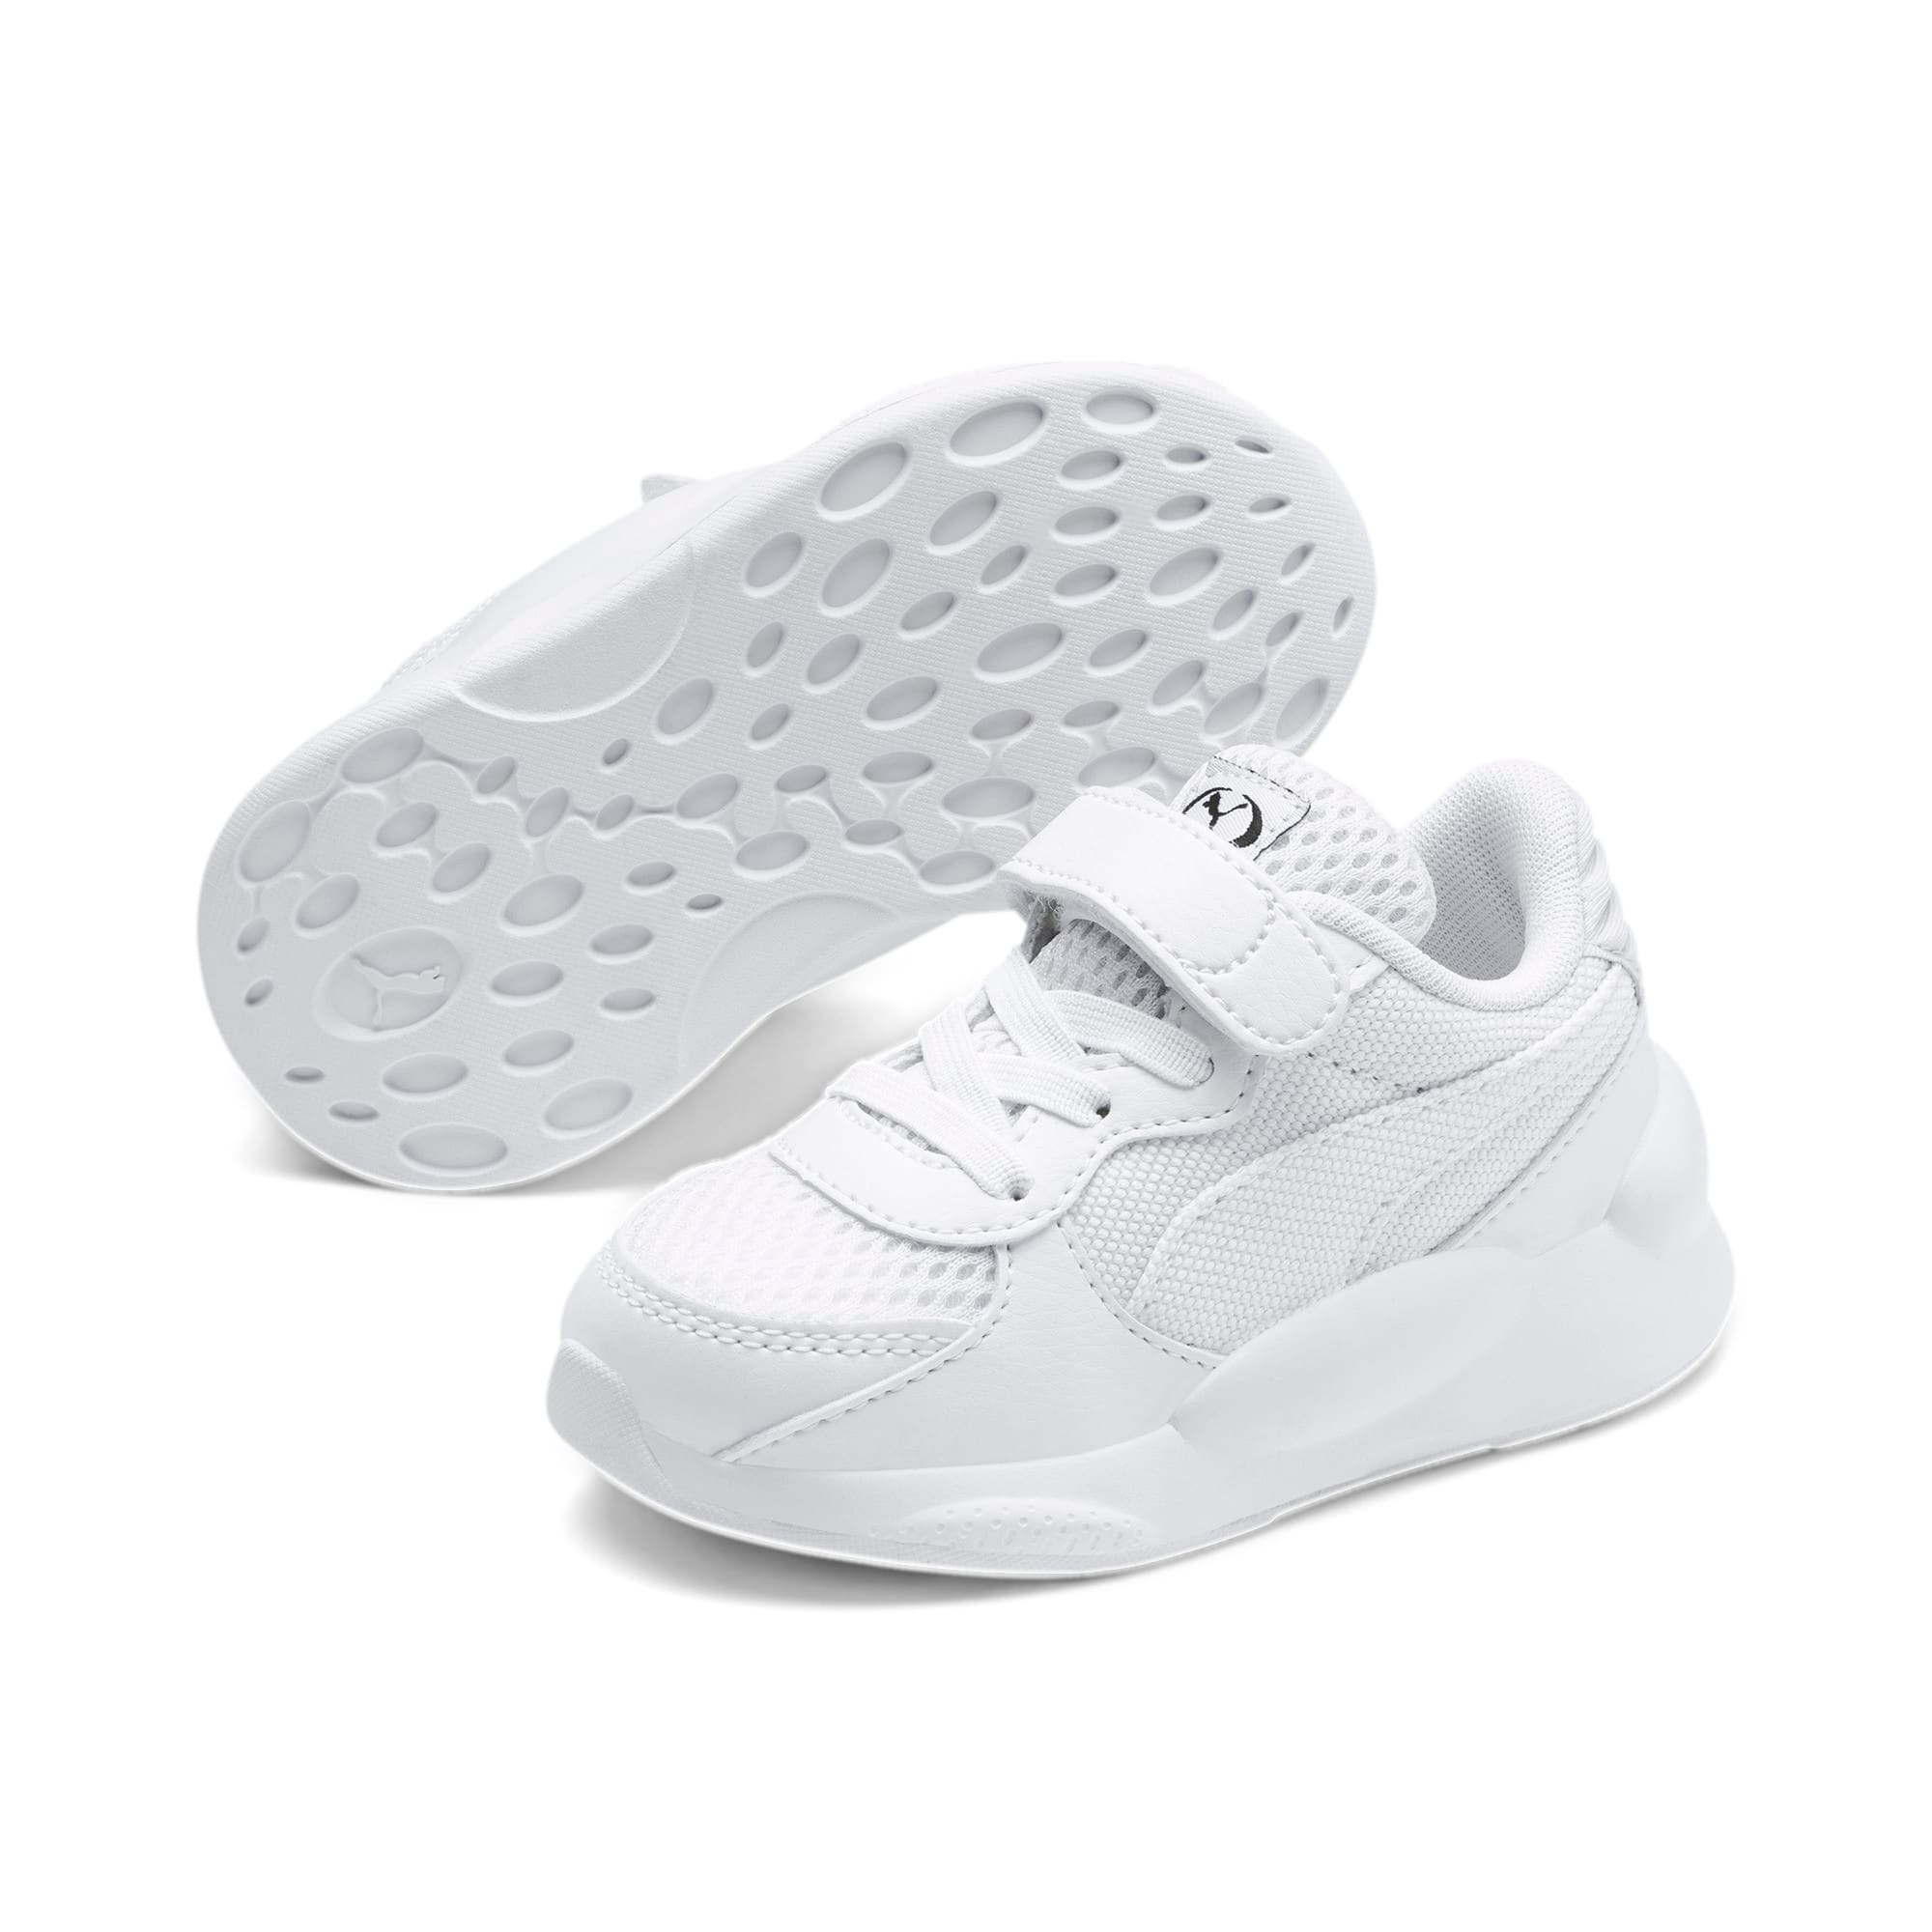 Thumbnail 2 of RS 9.8 Core Toddler Shoes, Puma White, medium